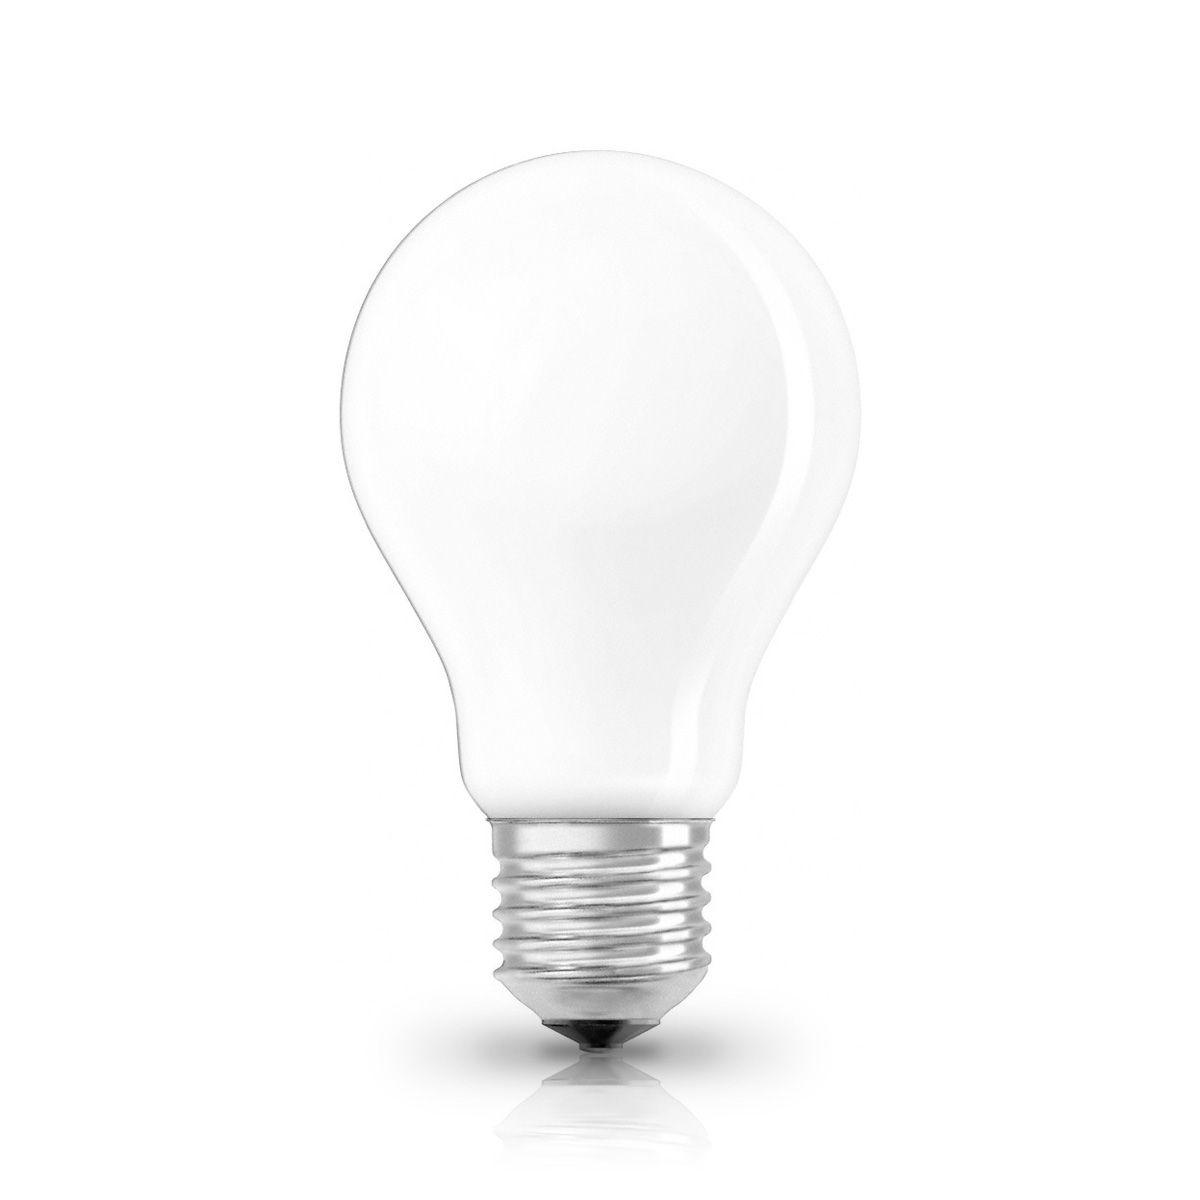 LED Bulb Osram LED SUPERSTAR RETROFIT FR DIM CLA 60 65W 840 E27 4000K 806lm